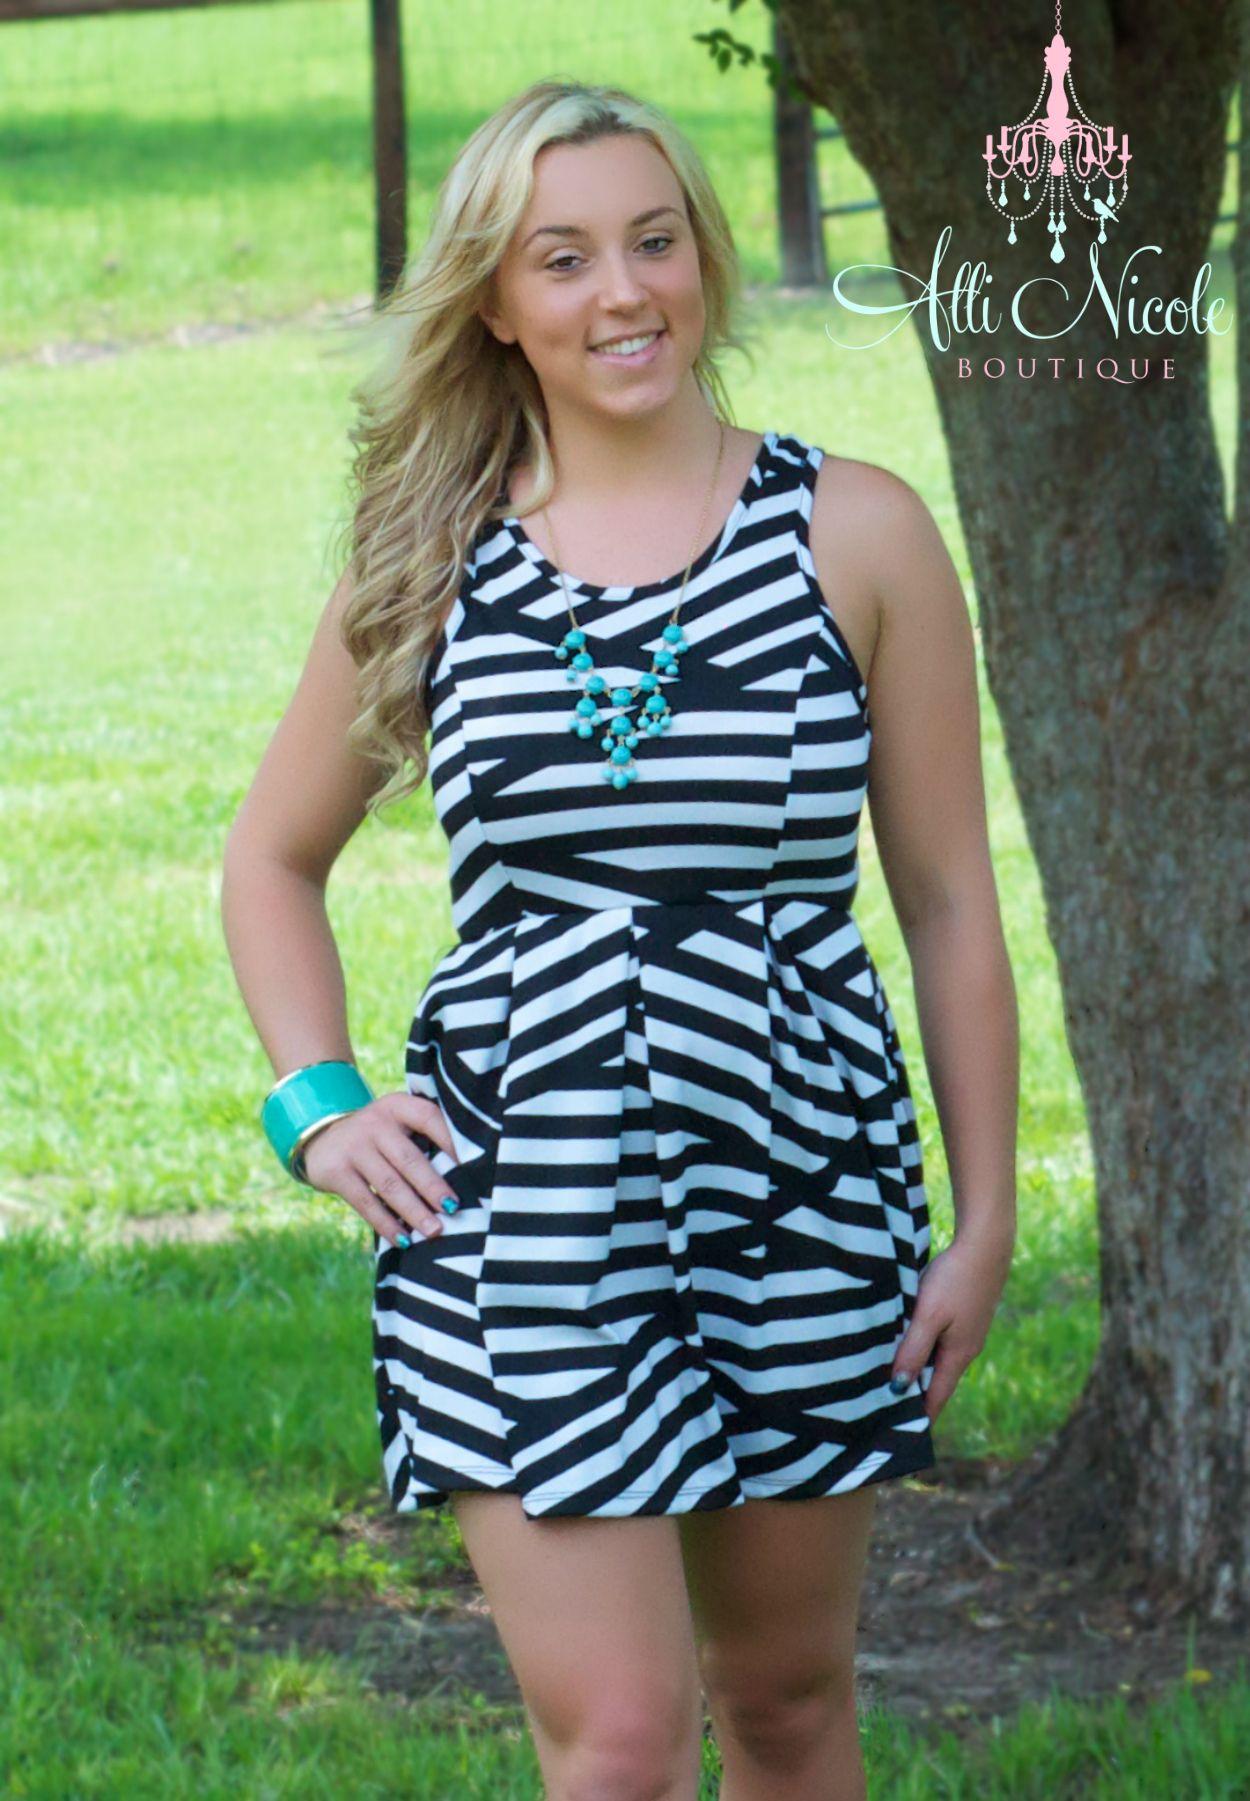 Simply Adorable Black & White Pattern Pleated Mini-Skirt Dress ... ON SALE!!! :)